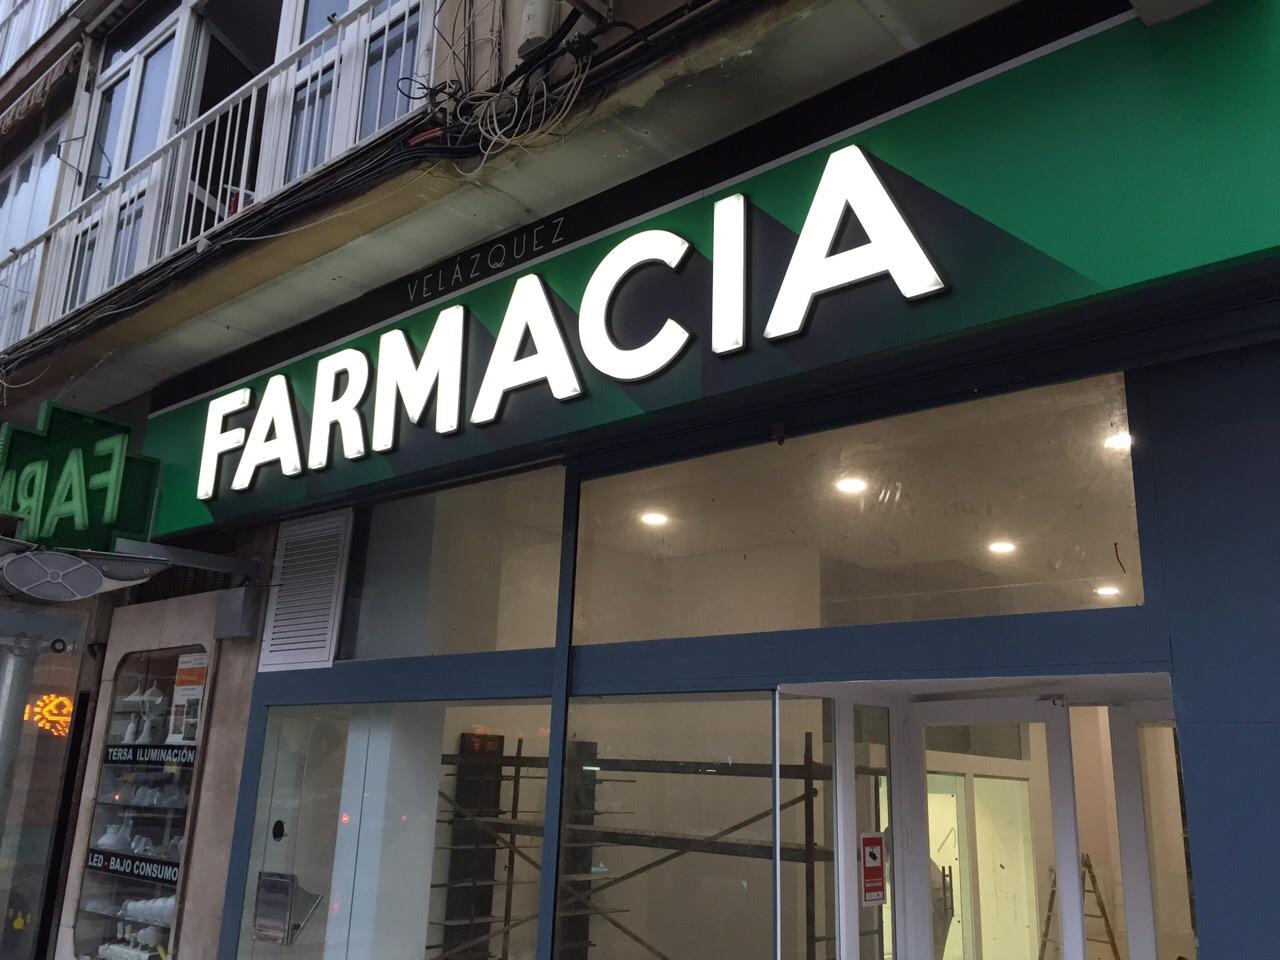 Letrero luminoso en la fachada para la farmacia Velázquez